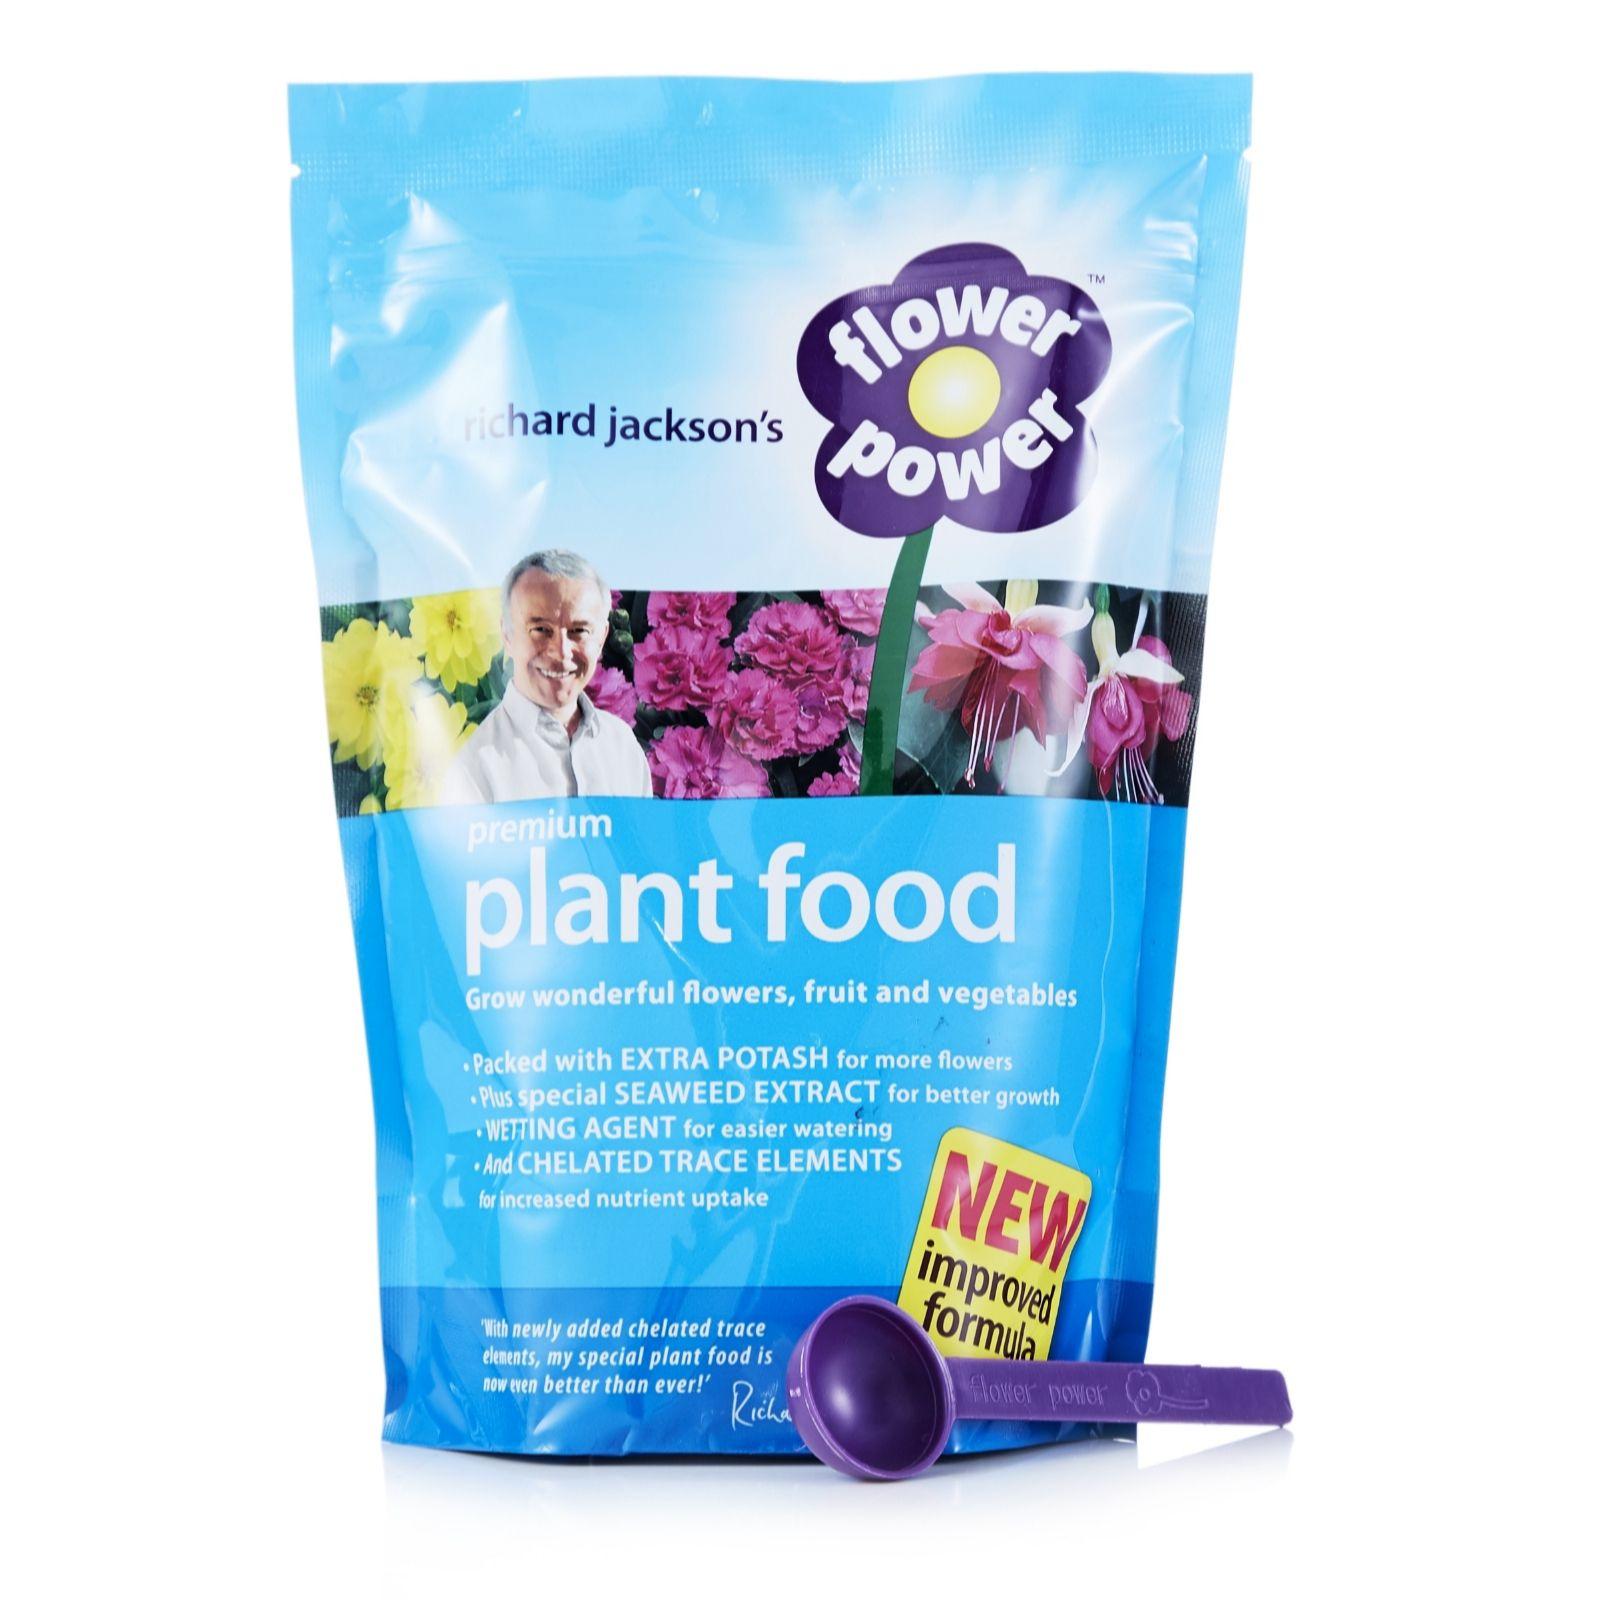 Richard Jackson 750g Flower Power Premium Plant Food   Page 1   QVC UK